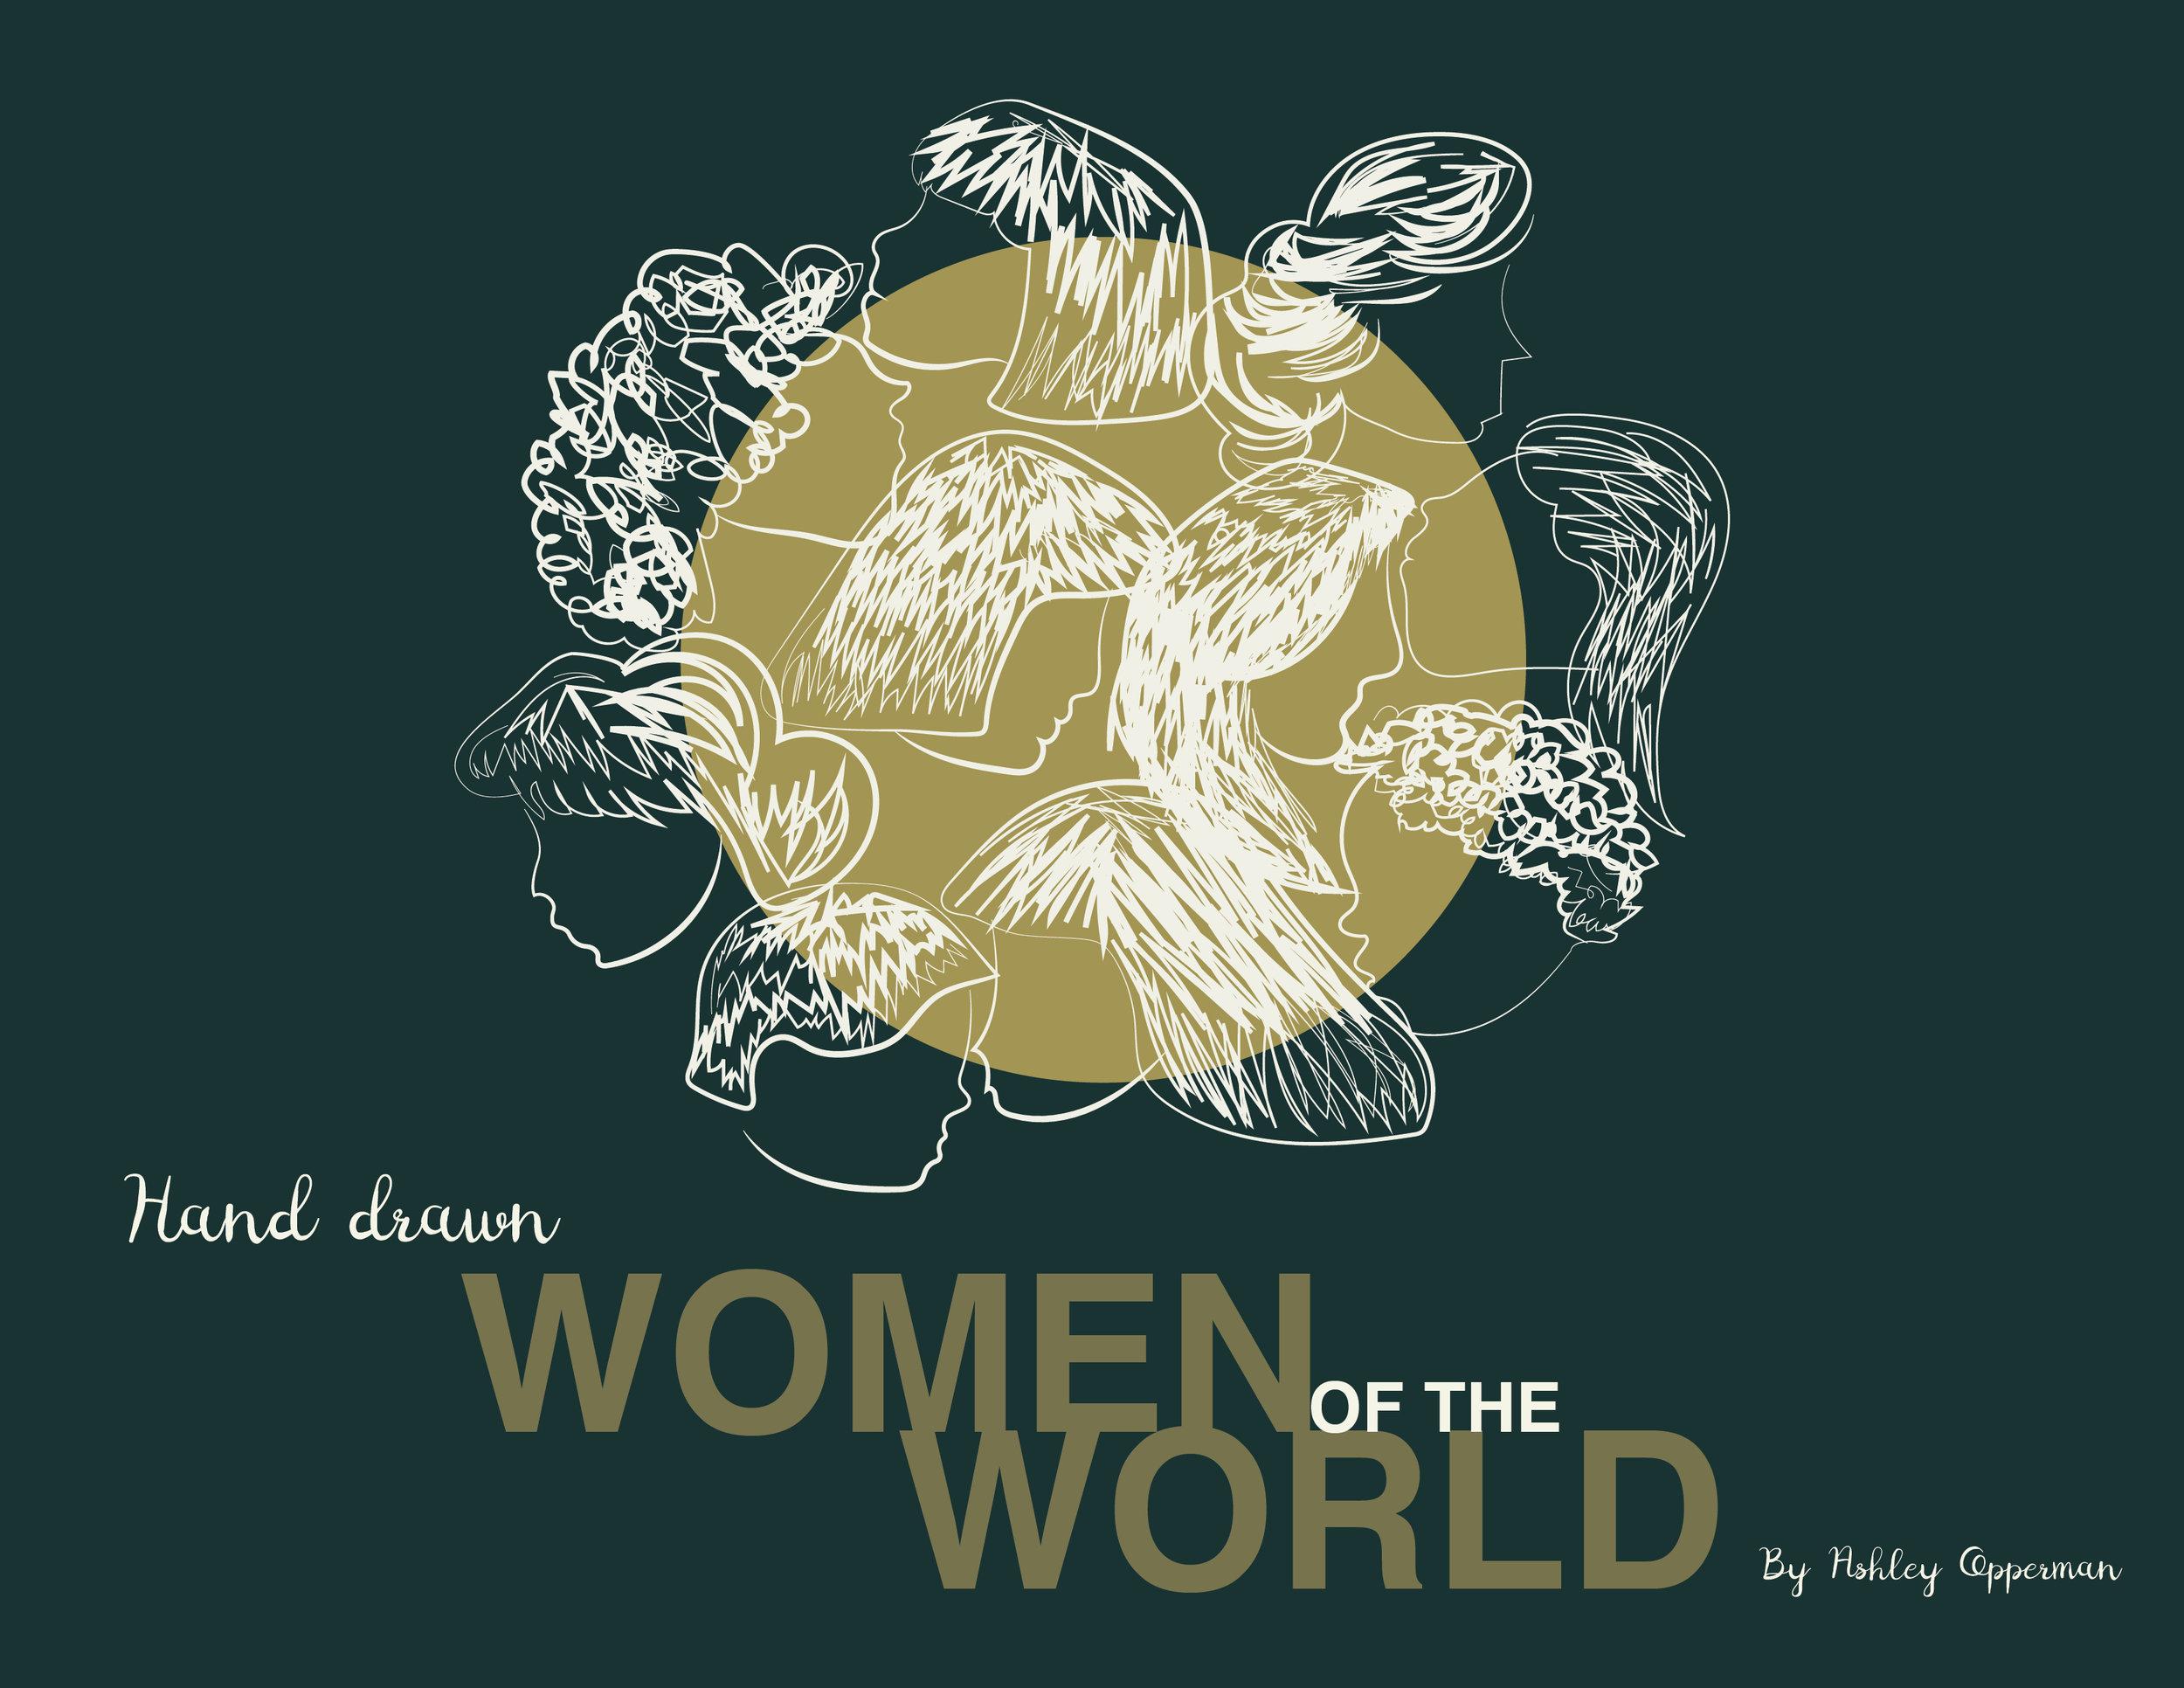 Woman_of_the_World-Oct2018-01.jpg